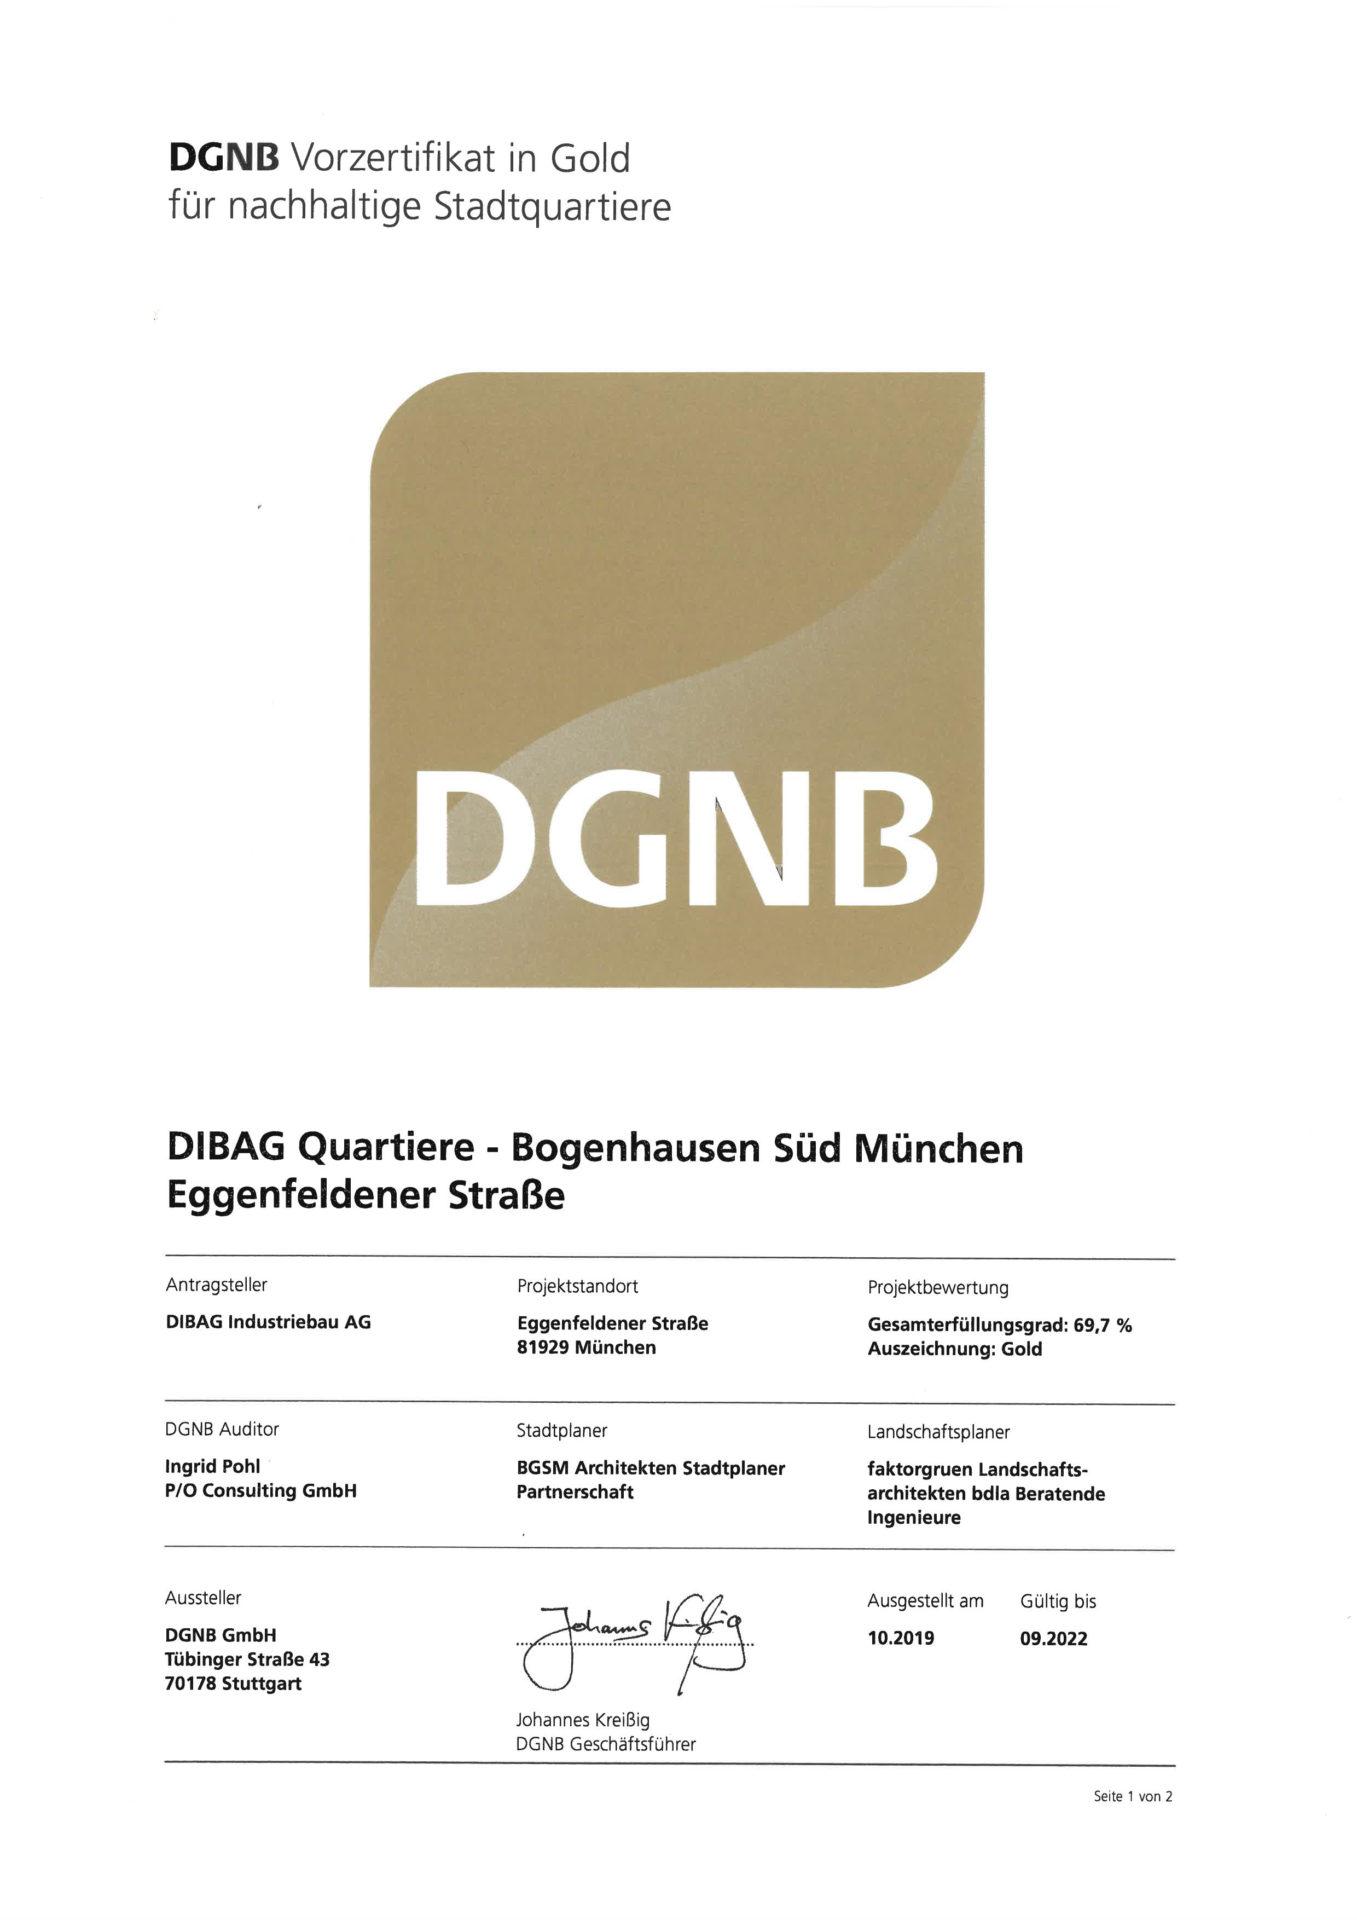 DGNB Zerifikat München, Eggenfeldener Straße